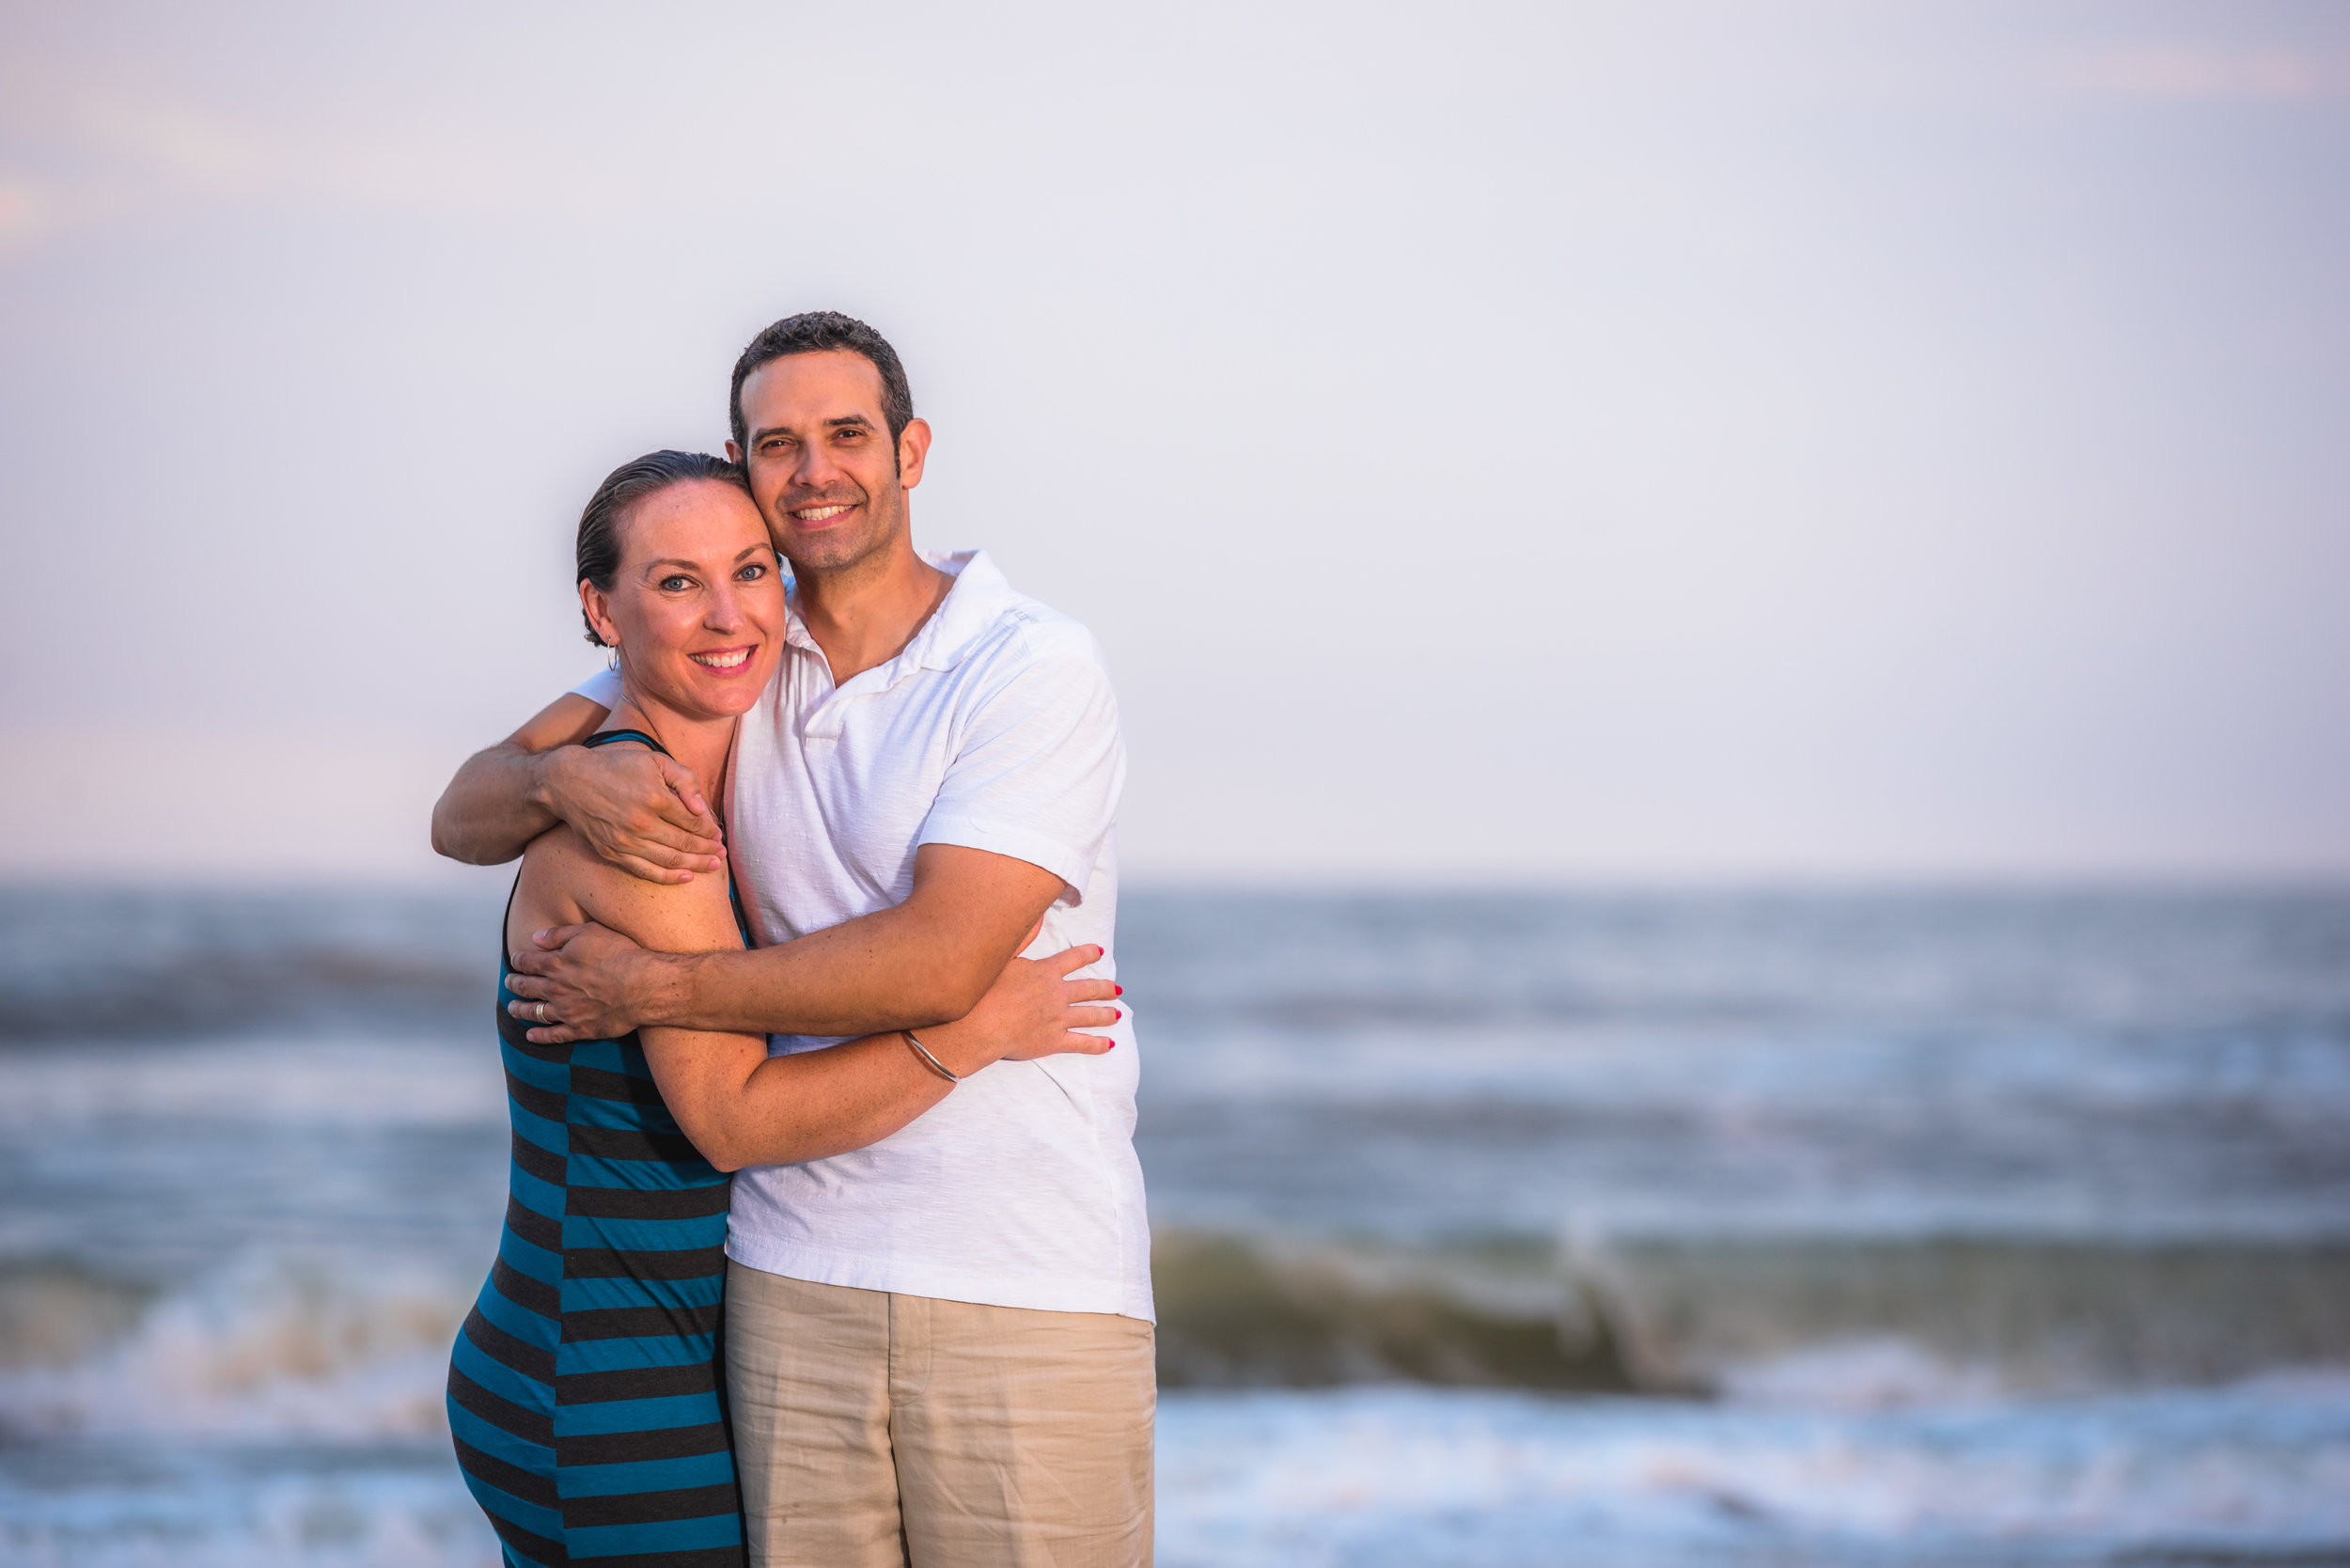 Long Beach Island Family Portraits | Adinda, Greg & James 19